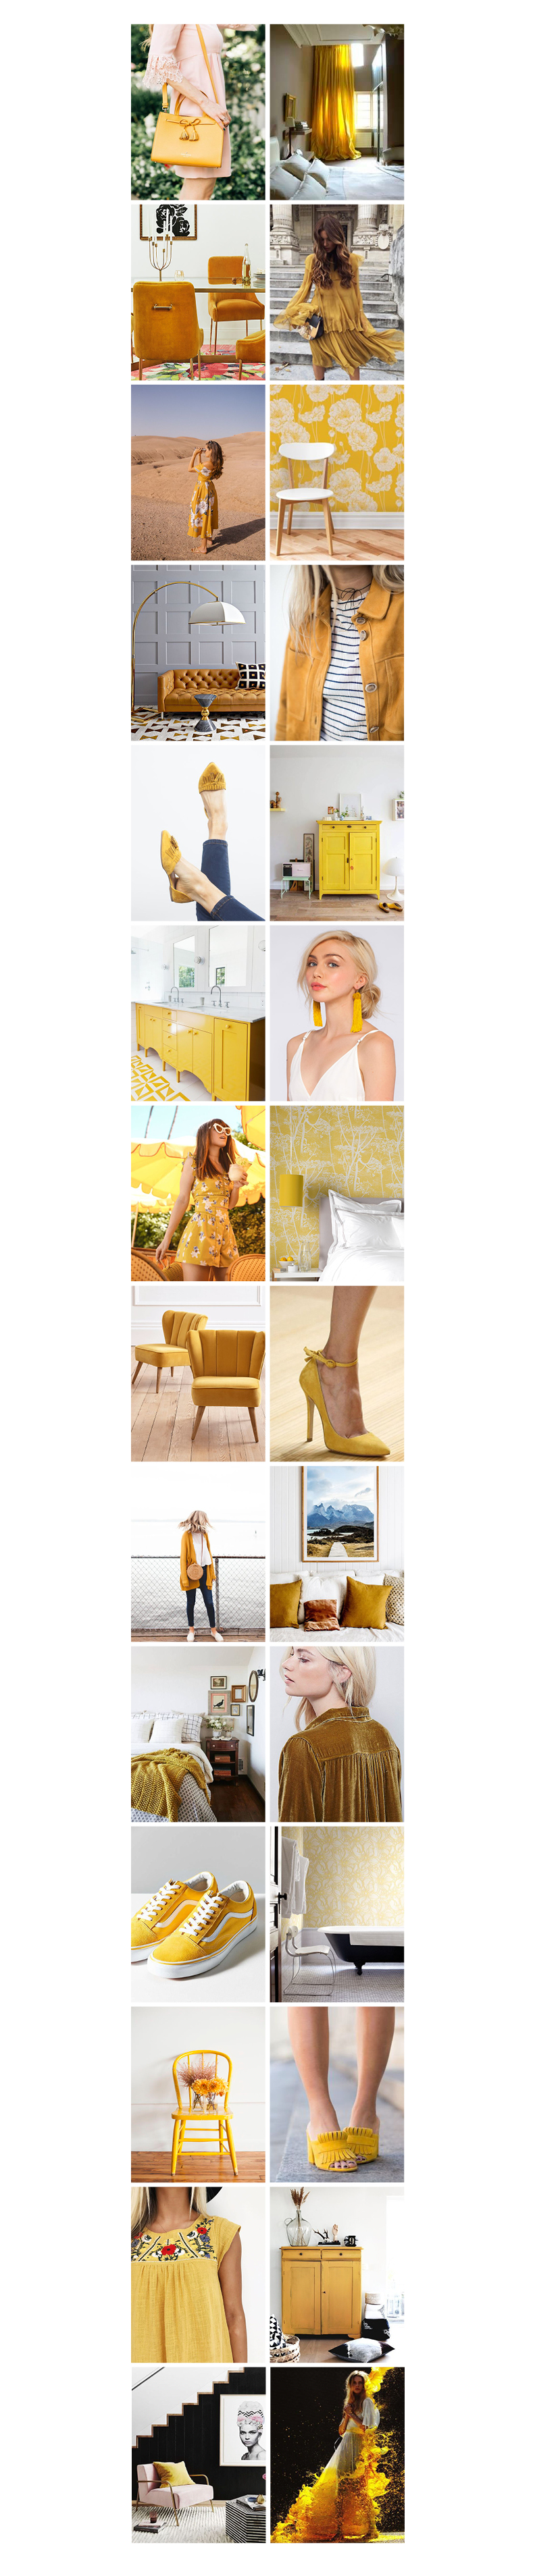 kris and kate studio_fashion vs interior trends_yellow